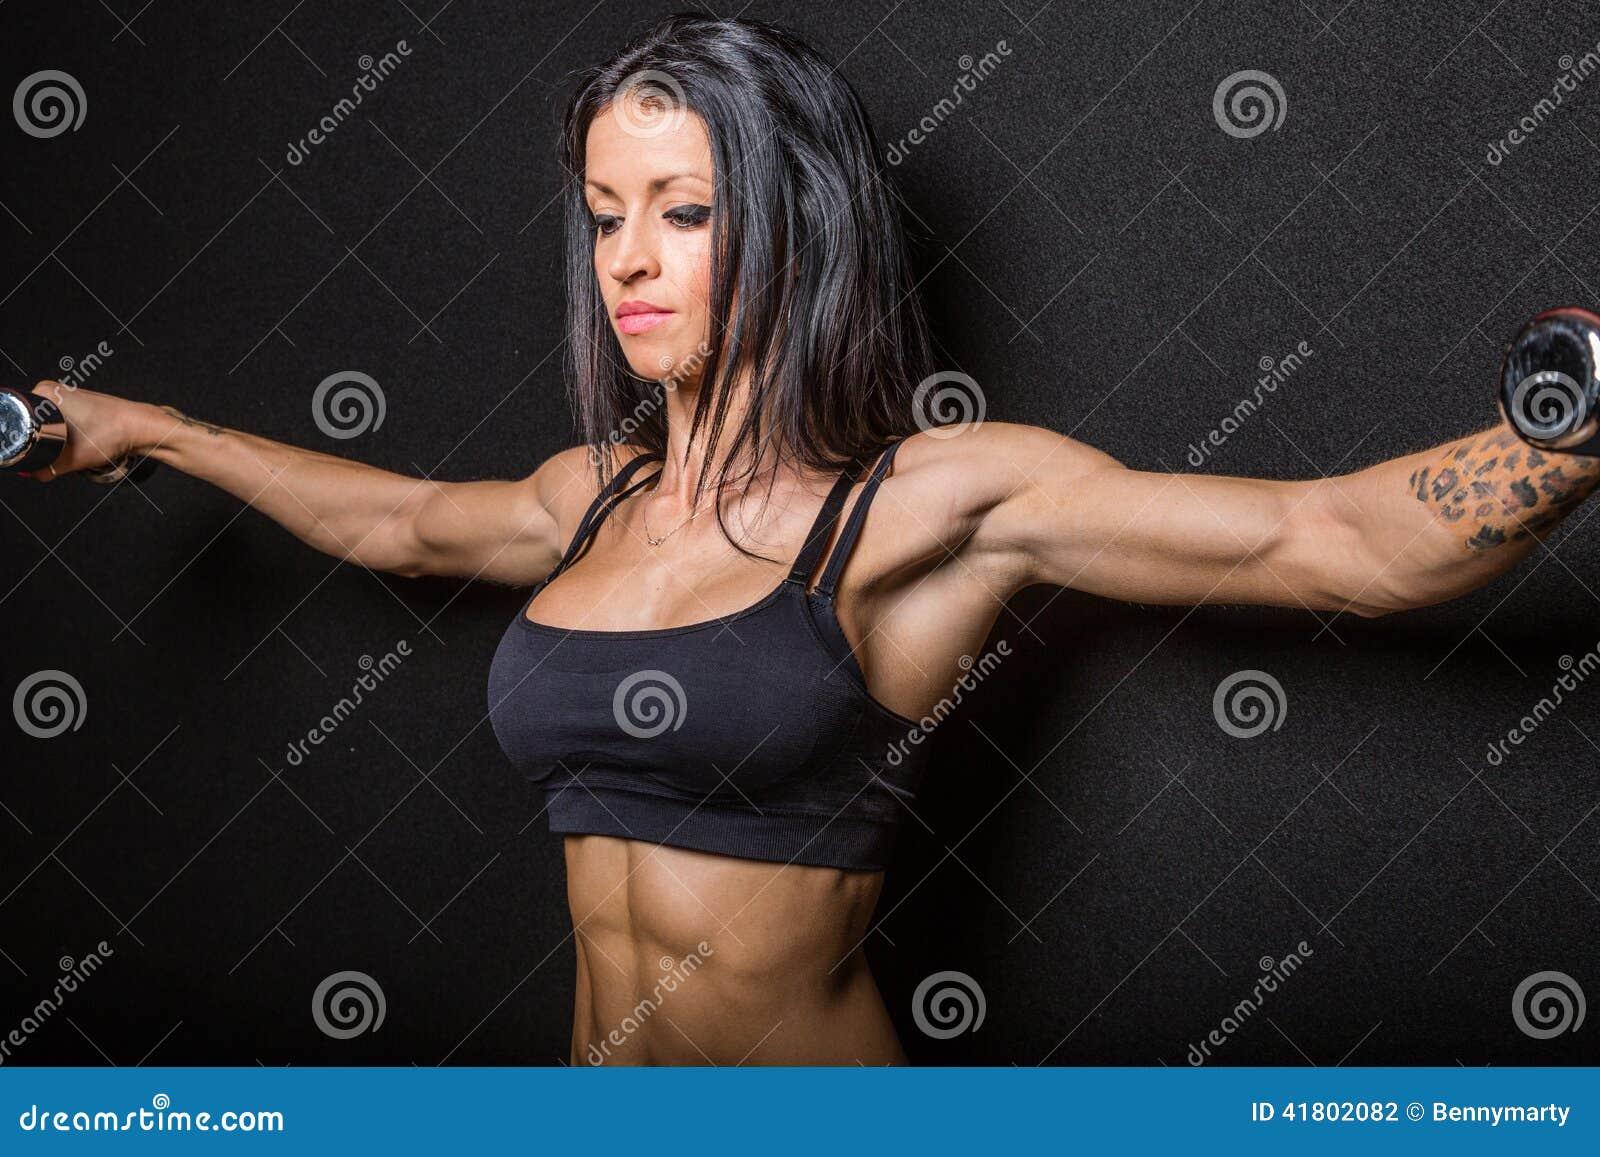 female bodybuilder muscle Black